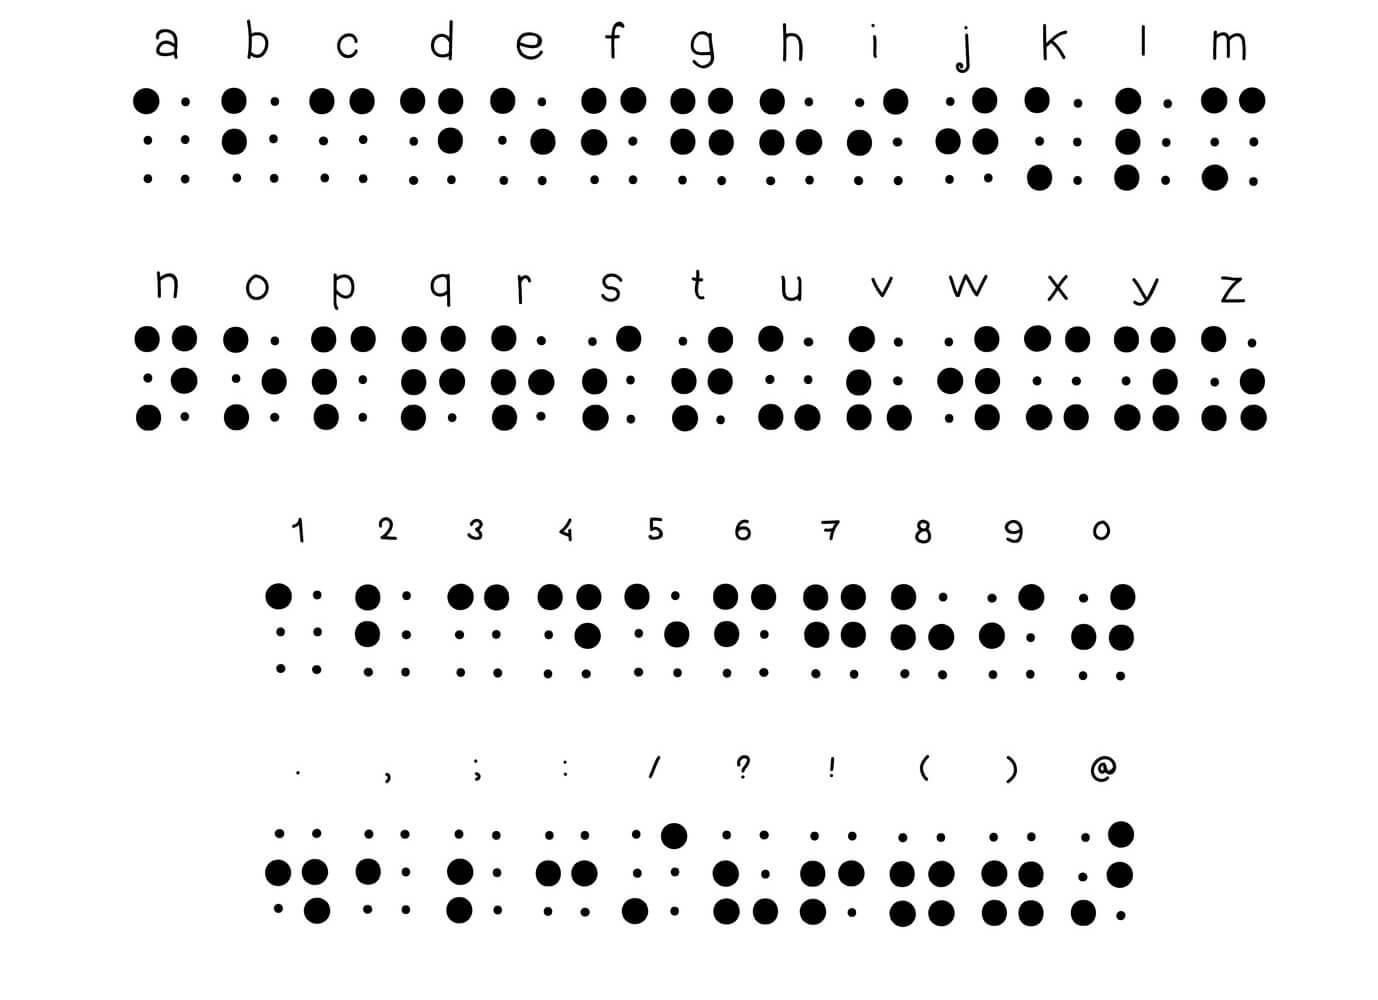 Imagen del alfabeto Braille